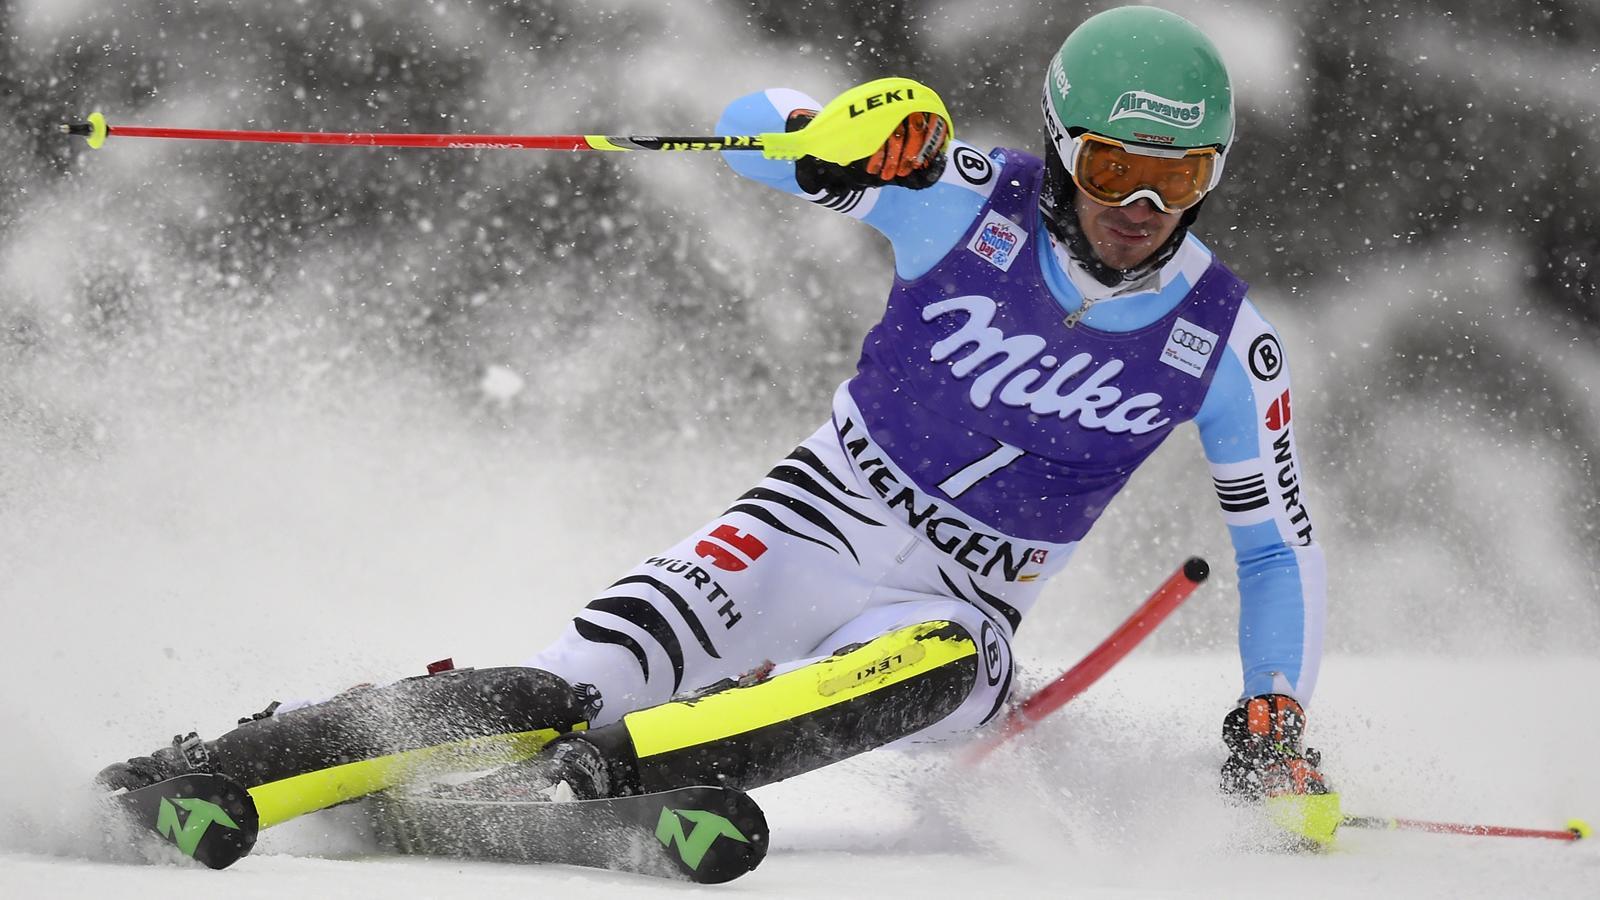 Neureuther wins as Hirscher fails to finish in Wengen slalom - Alpine Skiing - Eurosport British